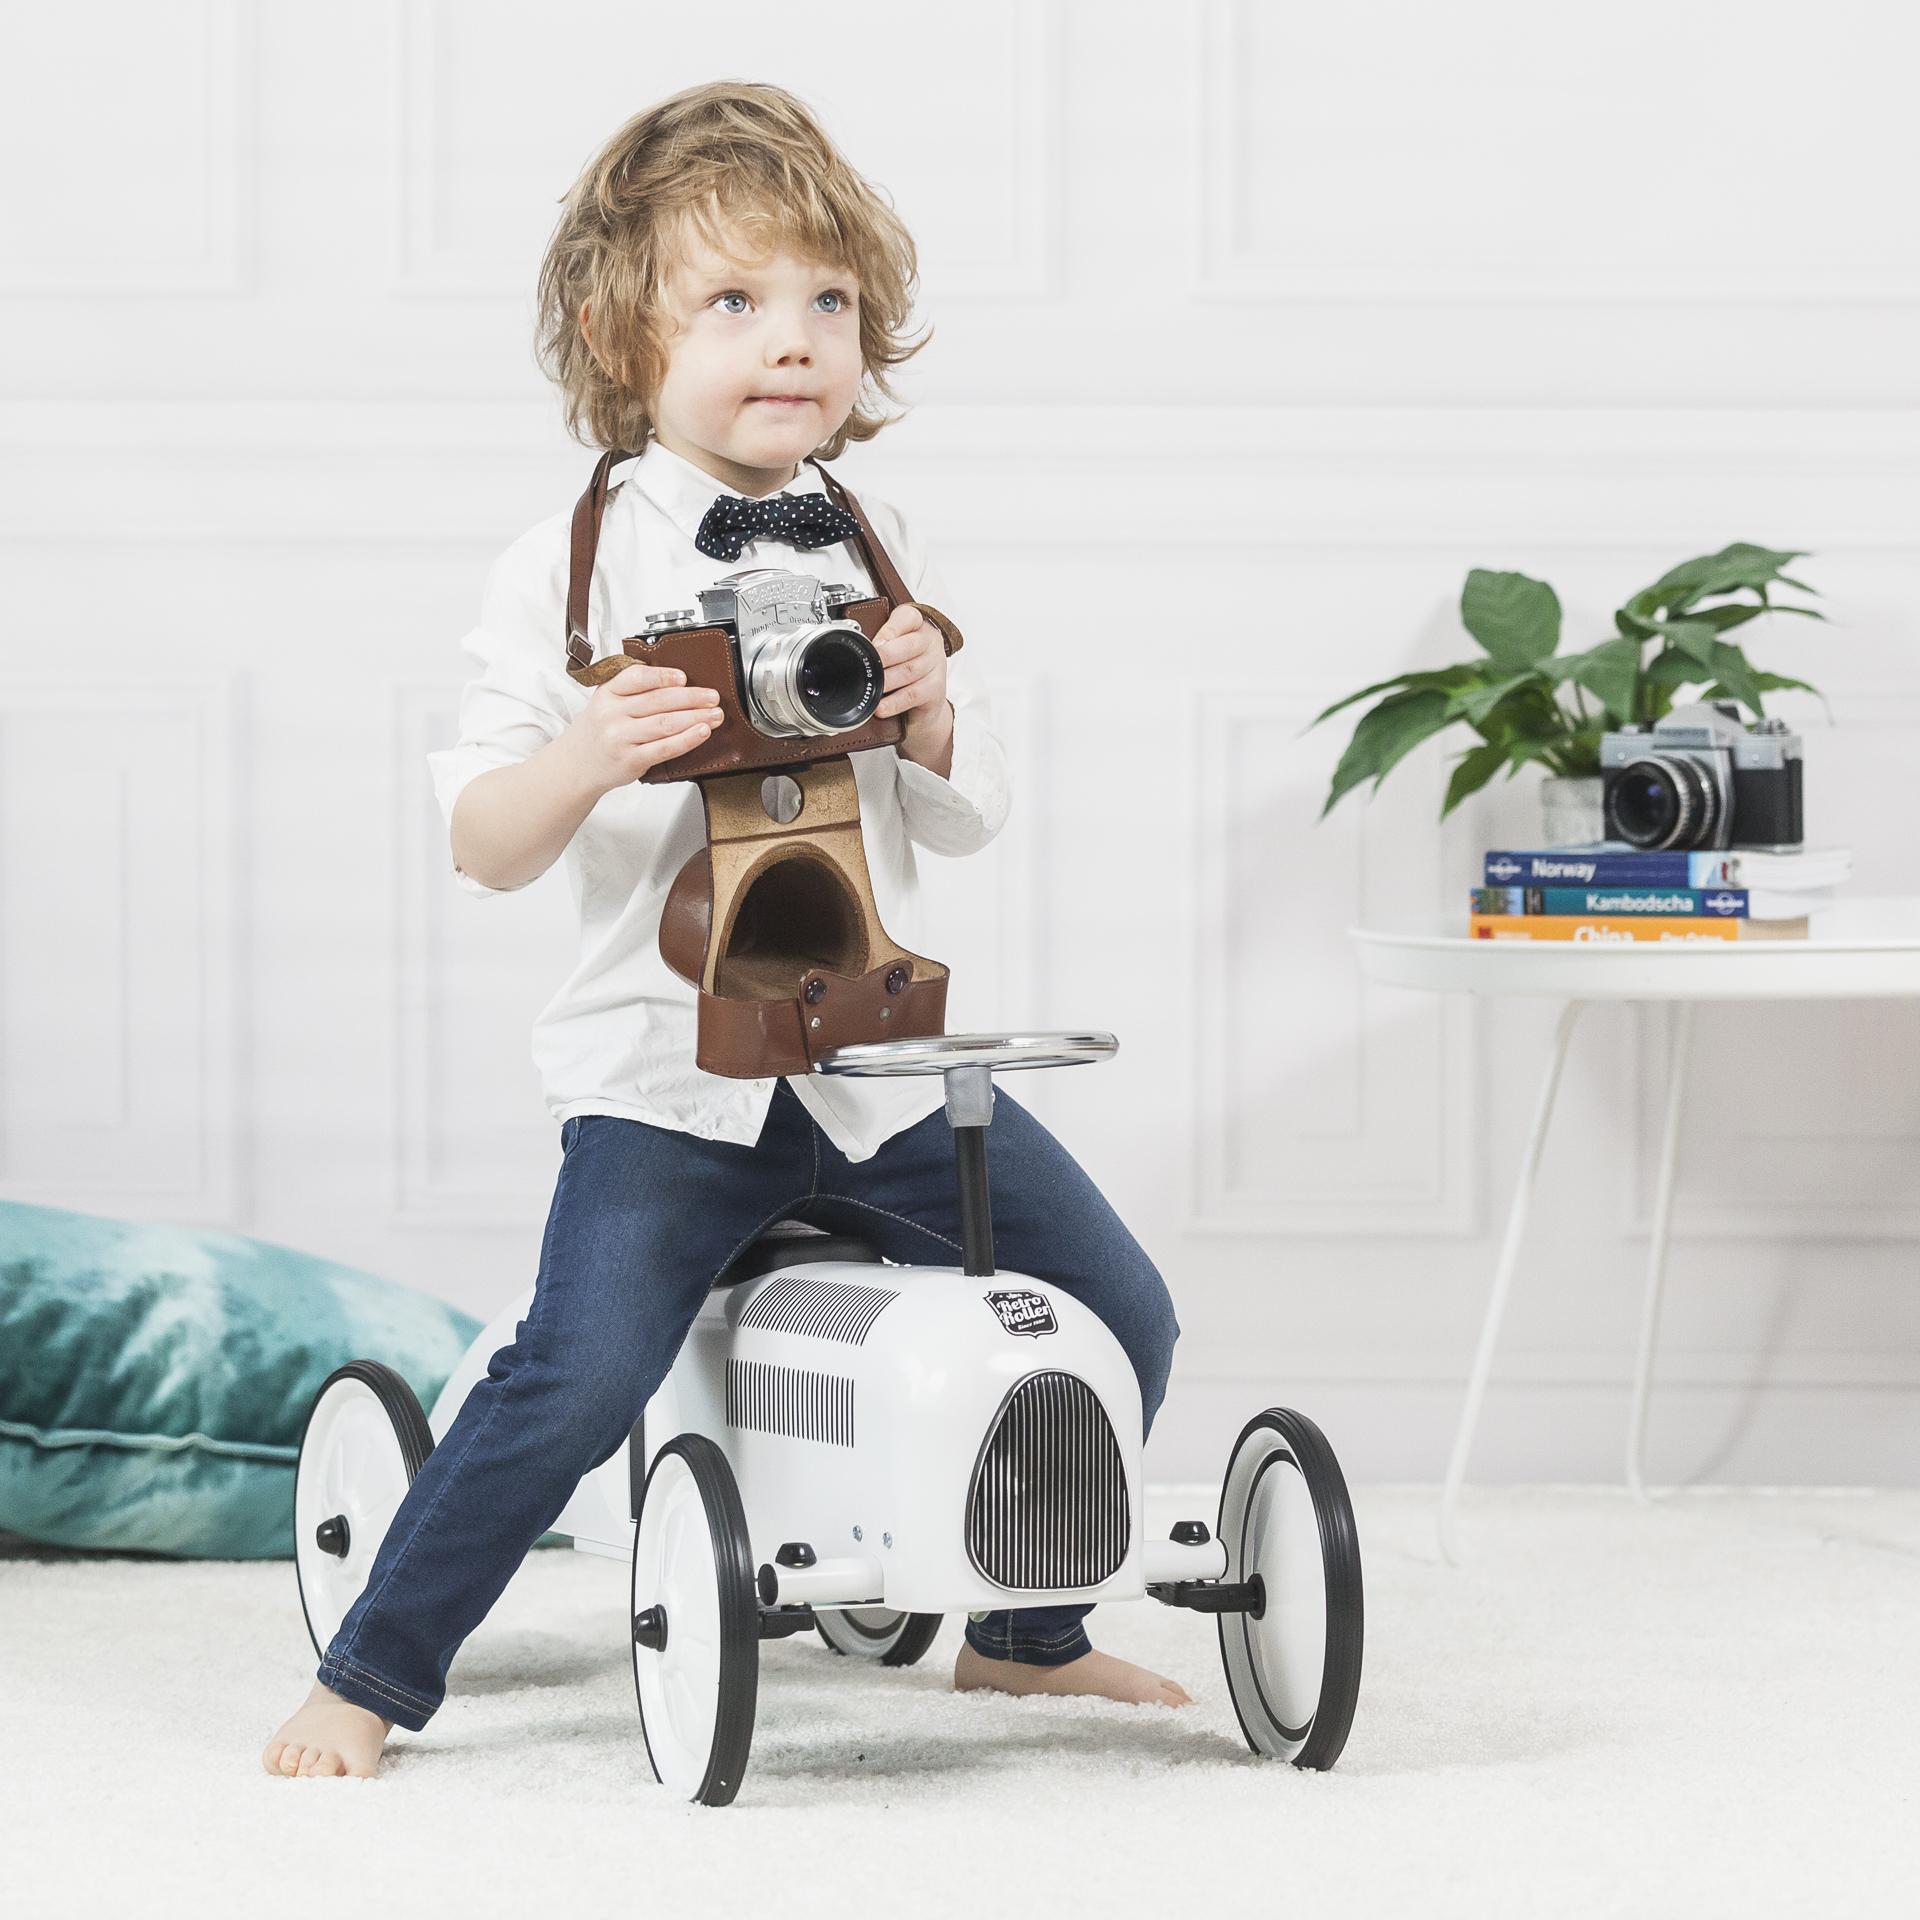 galerie-littlephotographers-11-kindergartenfotografie